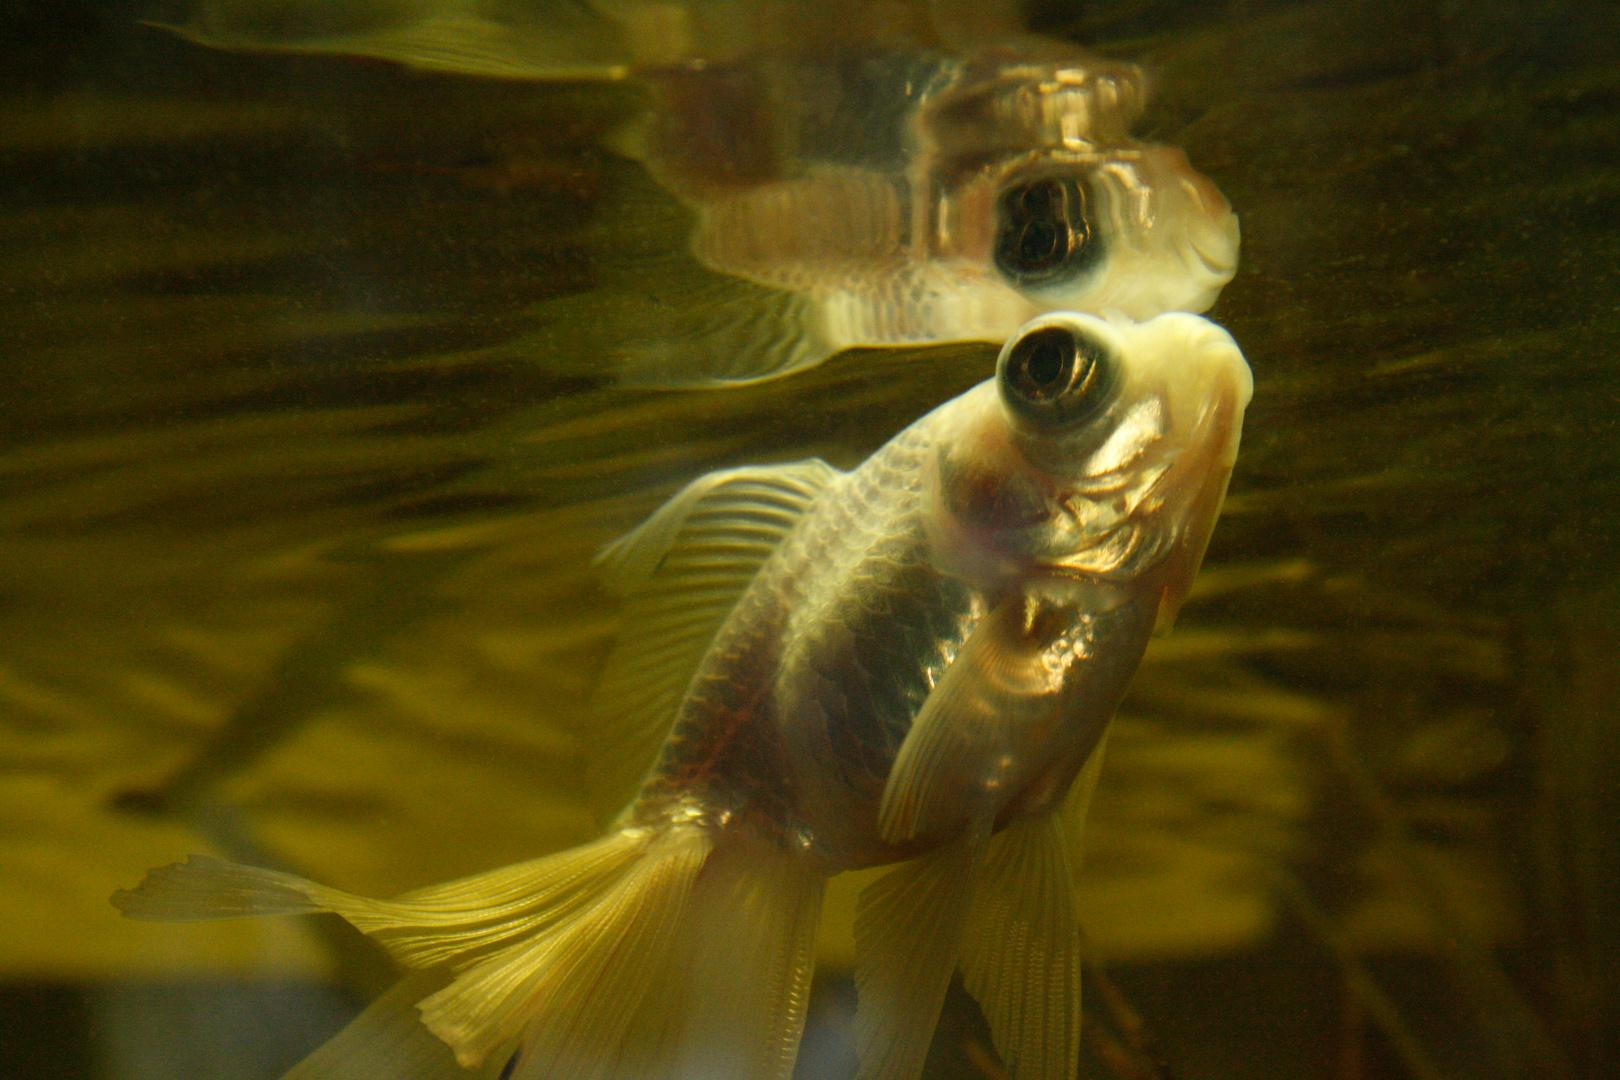 ...Fisch...